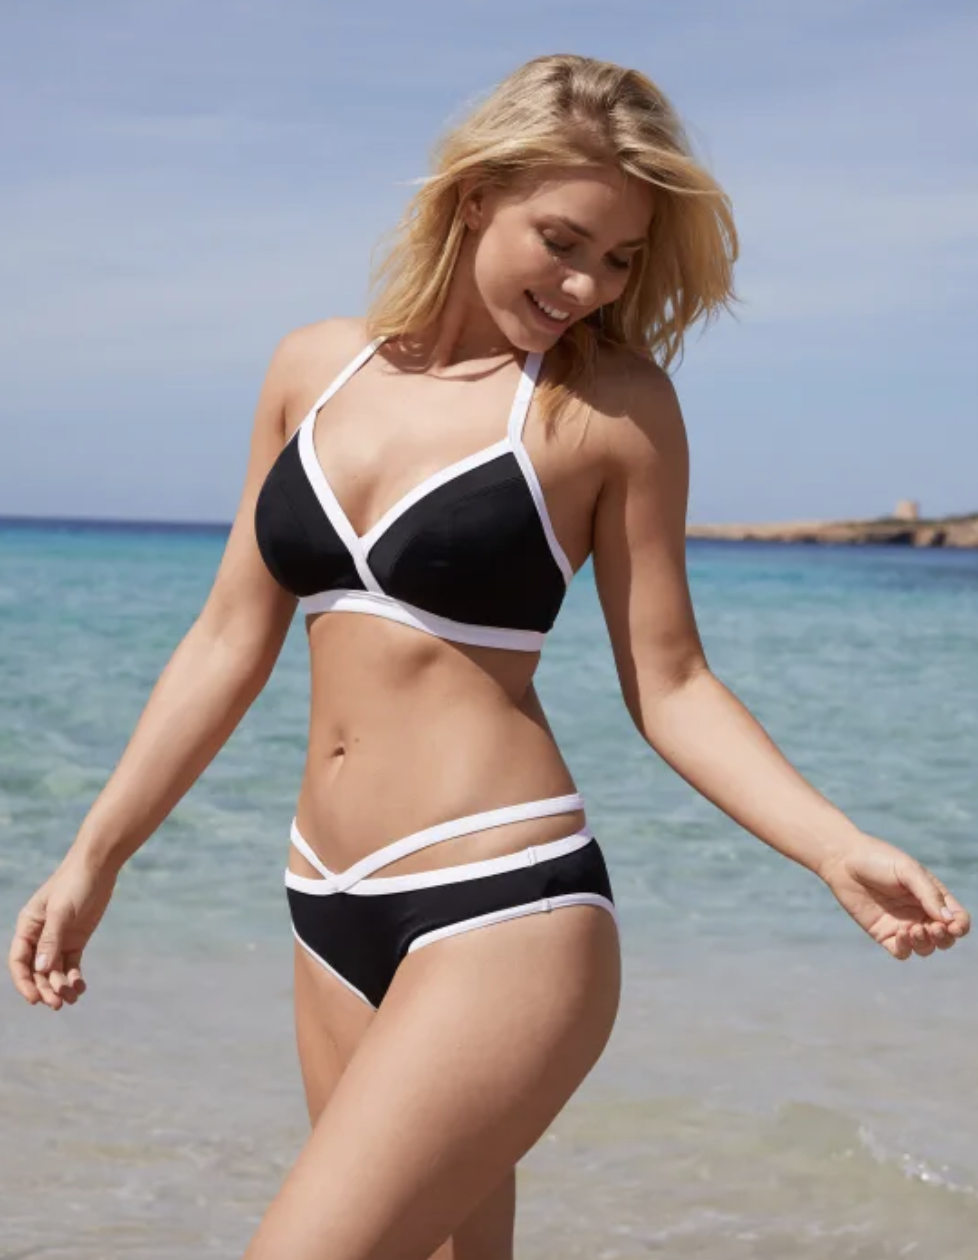 model wearing black bikini with white trim